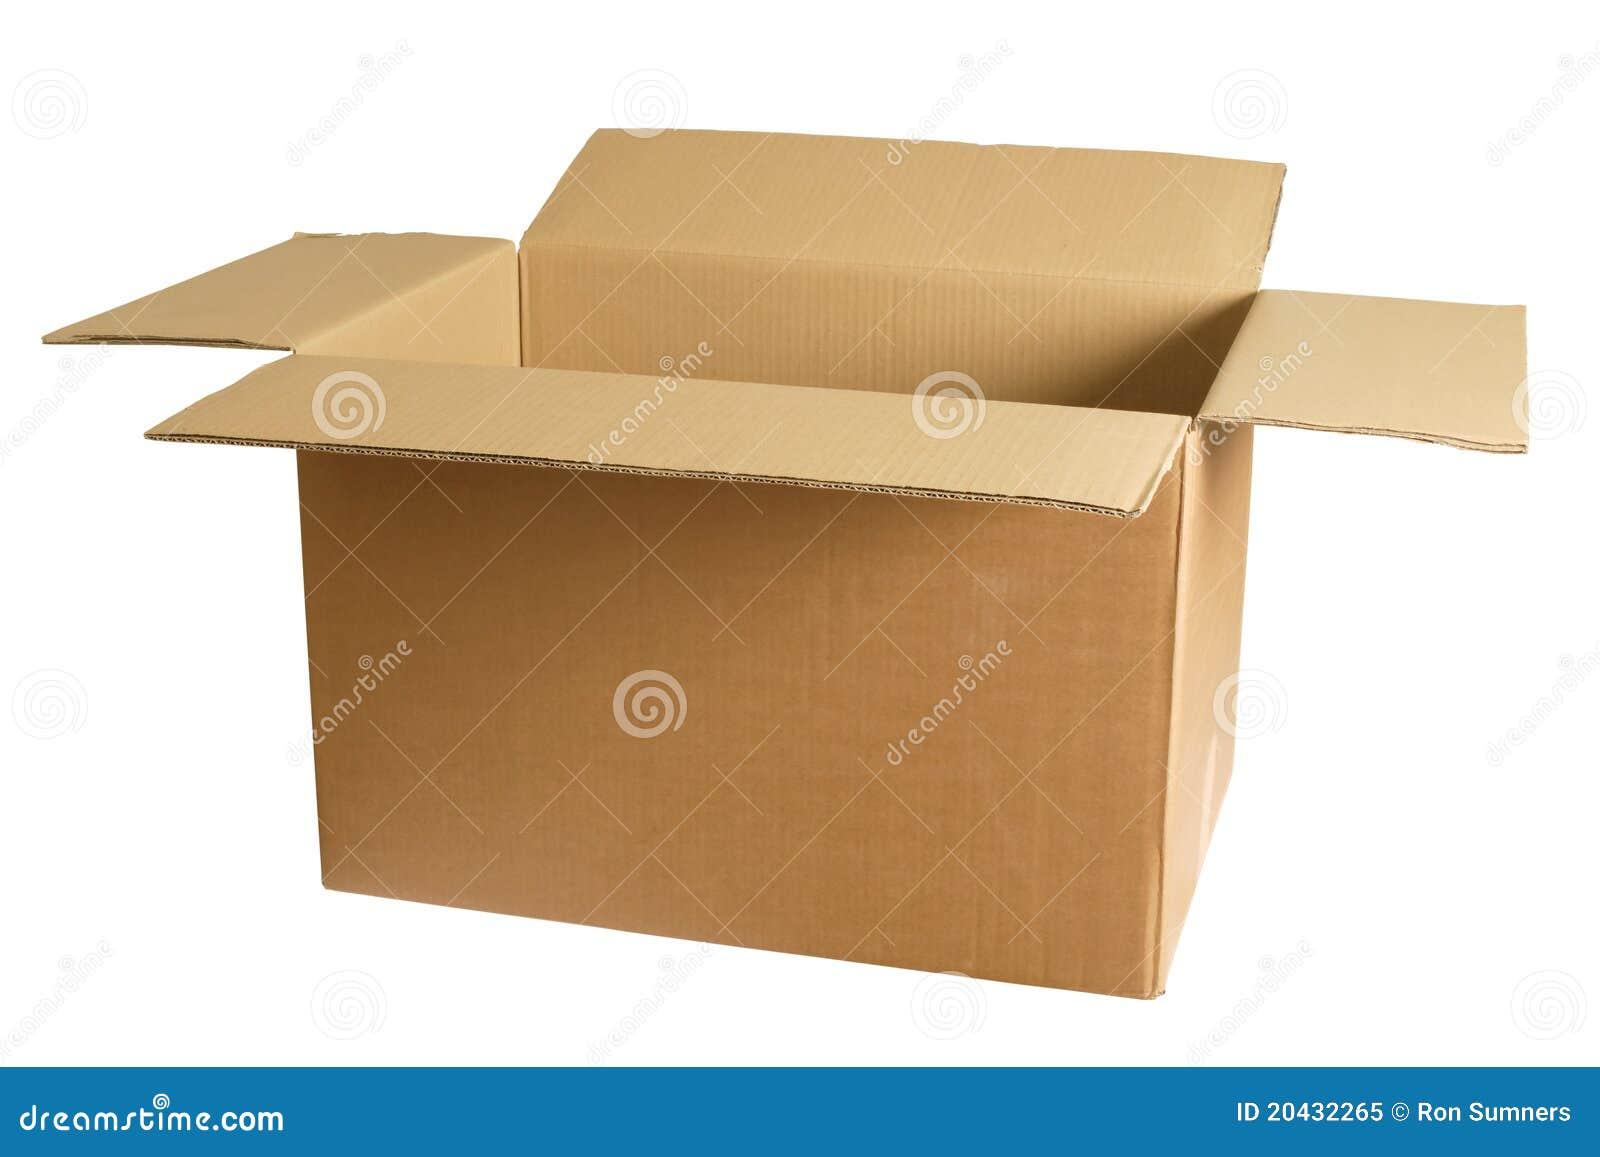 Scatola di cartone vuota